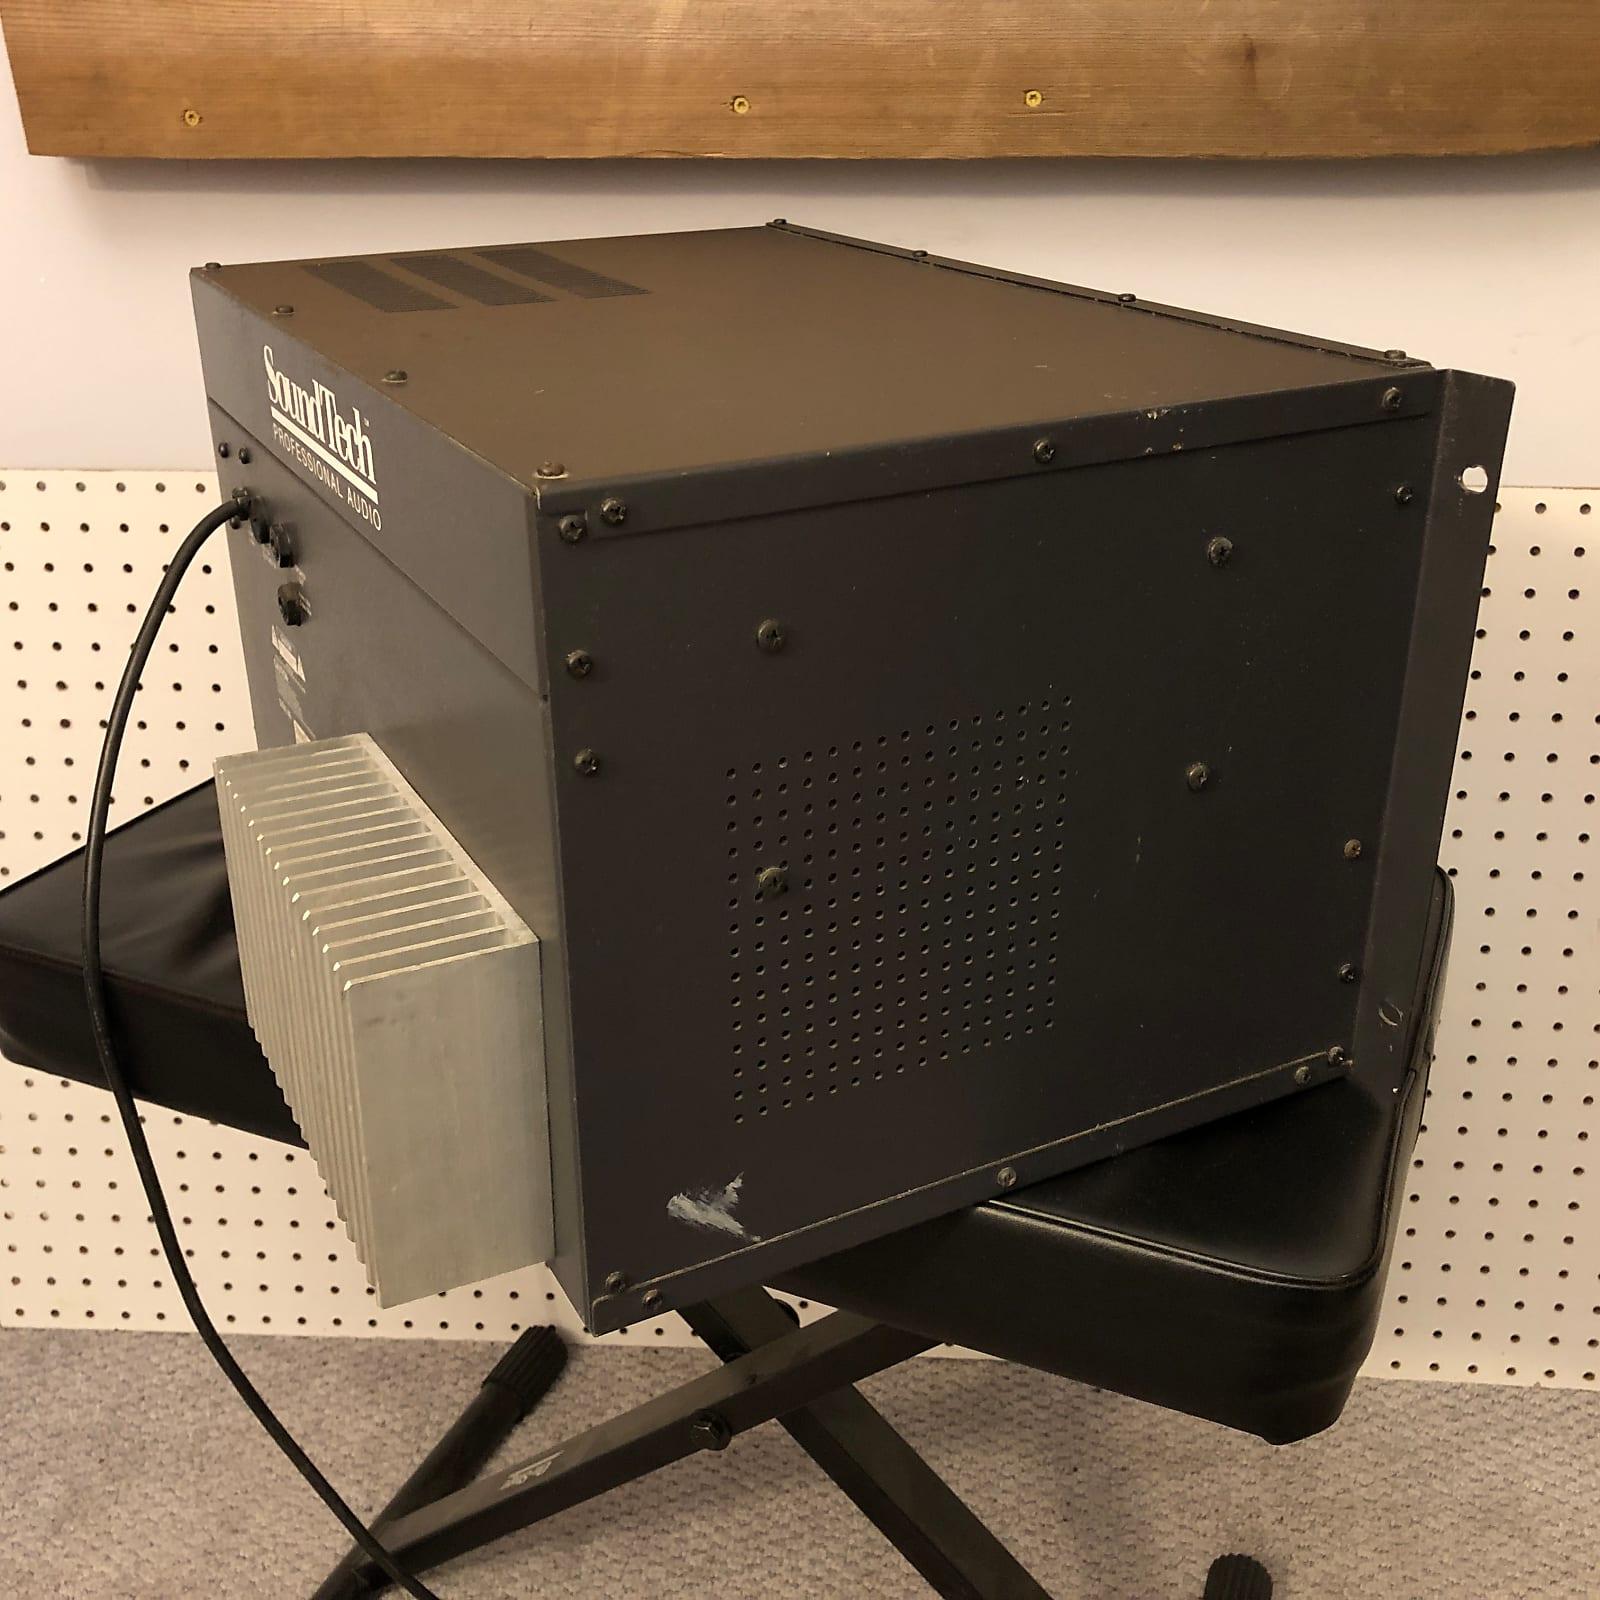 SoundTech M420 4-Channel Powered Mixer Rackmount